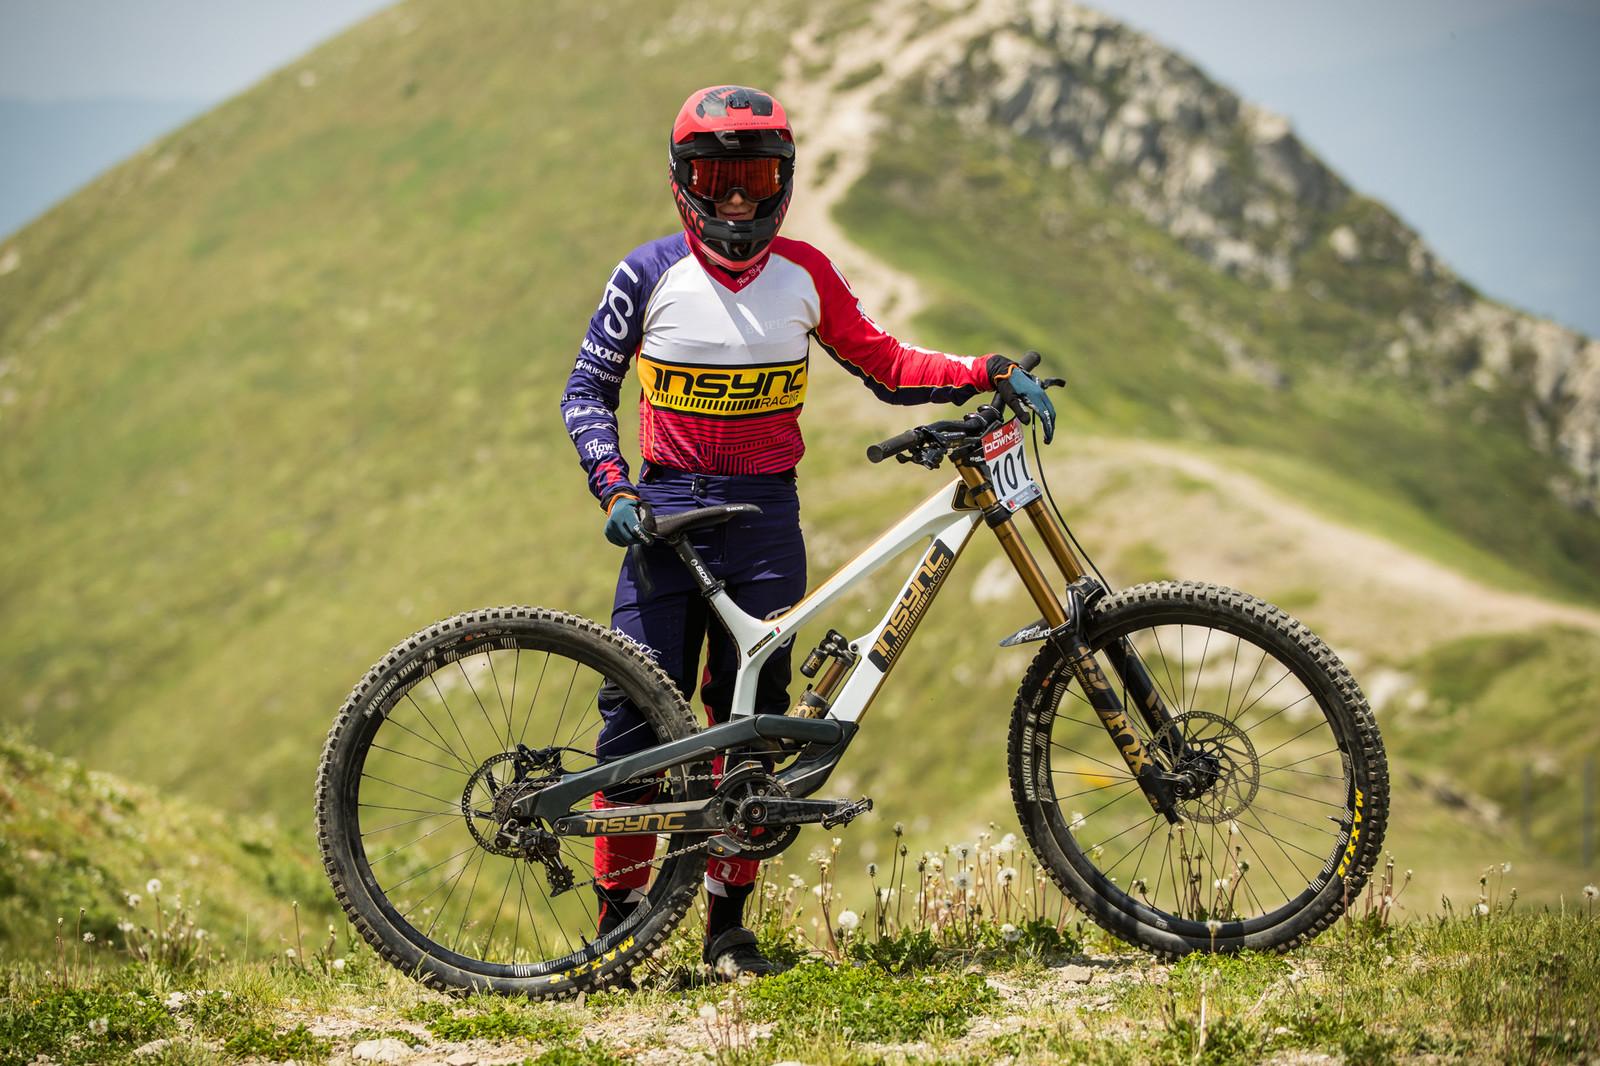 Insync teamrider and fastest qualifier, Veronika Widmann - 25 Downhill Bikes - iXS DH Cup #3 - Abetone - Mountain Biking Pictures - Vital MTB